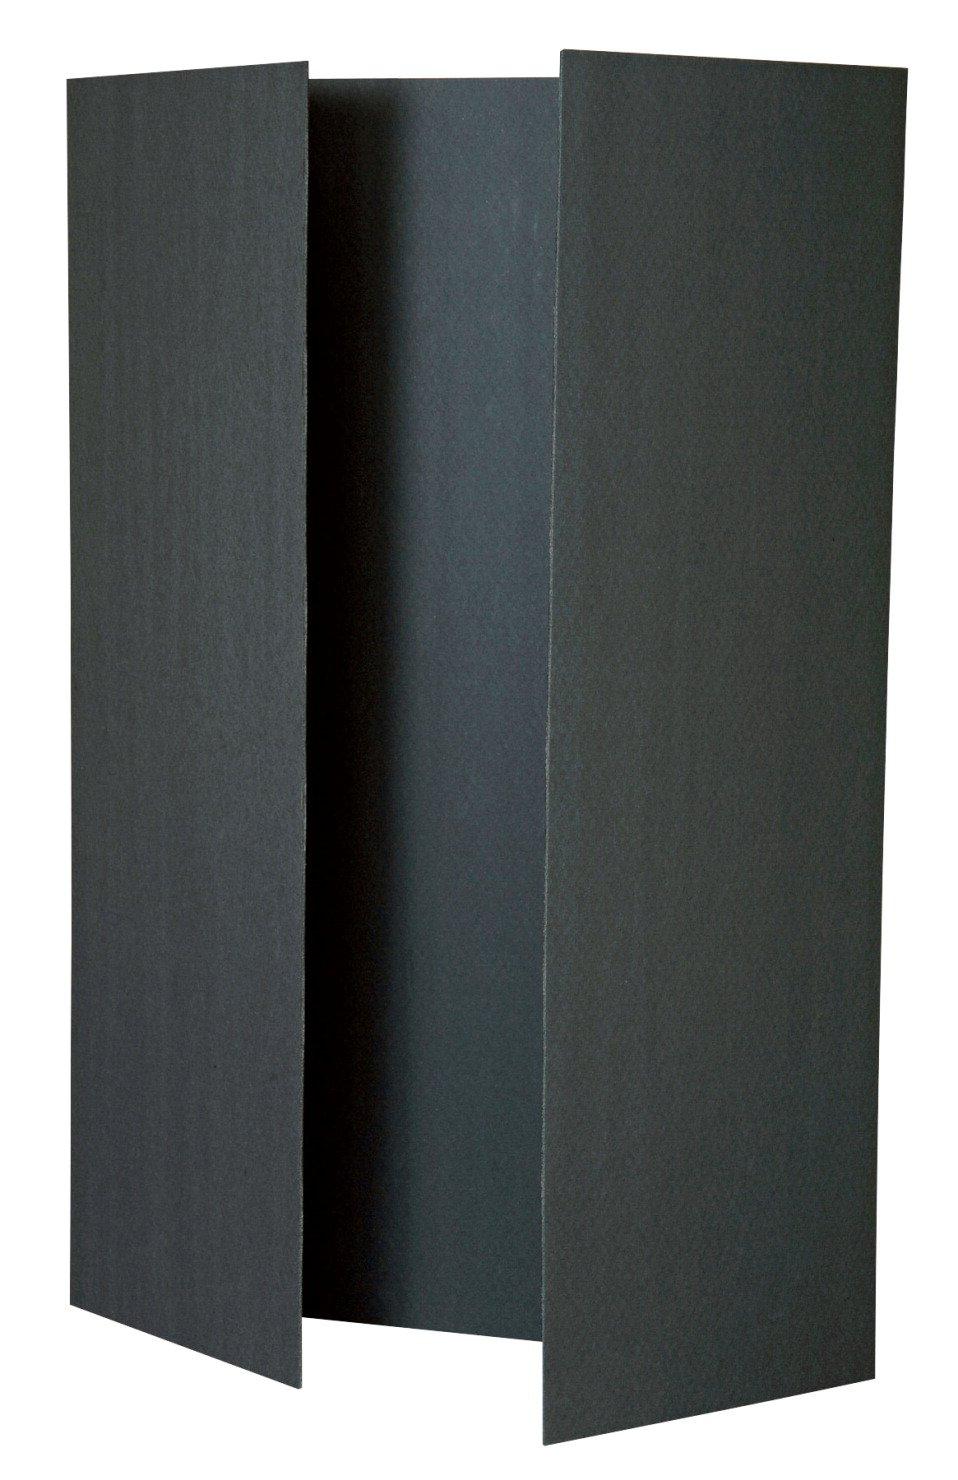 Pacon Value Foam Acid-Free Tri-Fold Presentation Board, 48 X 36 in, 3/16 in Thickness, Black, Case of 12